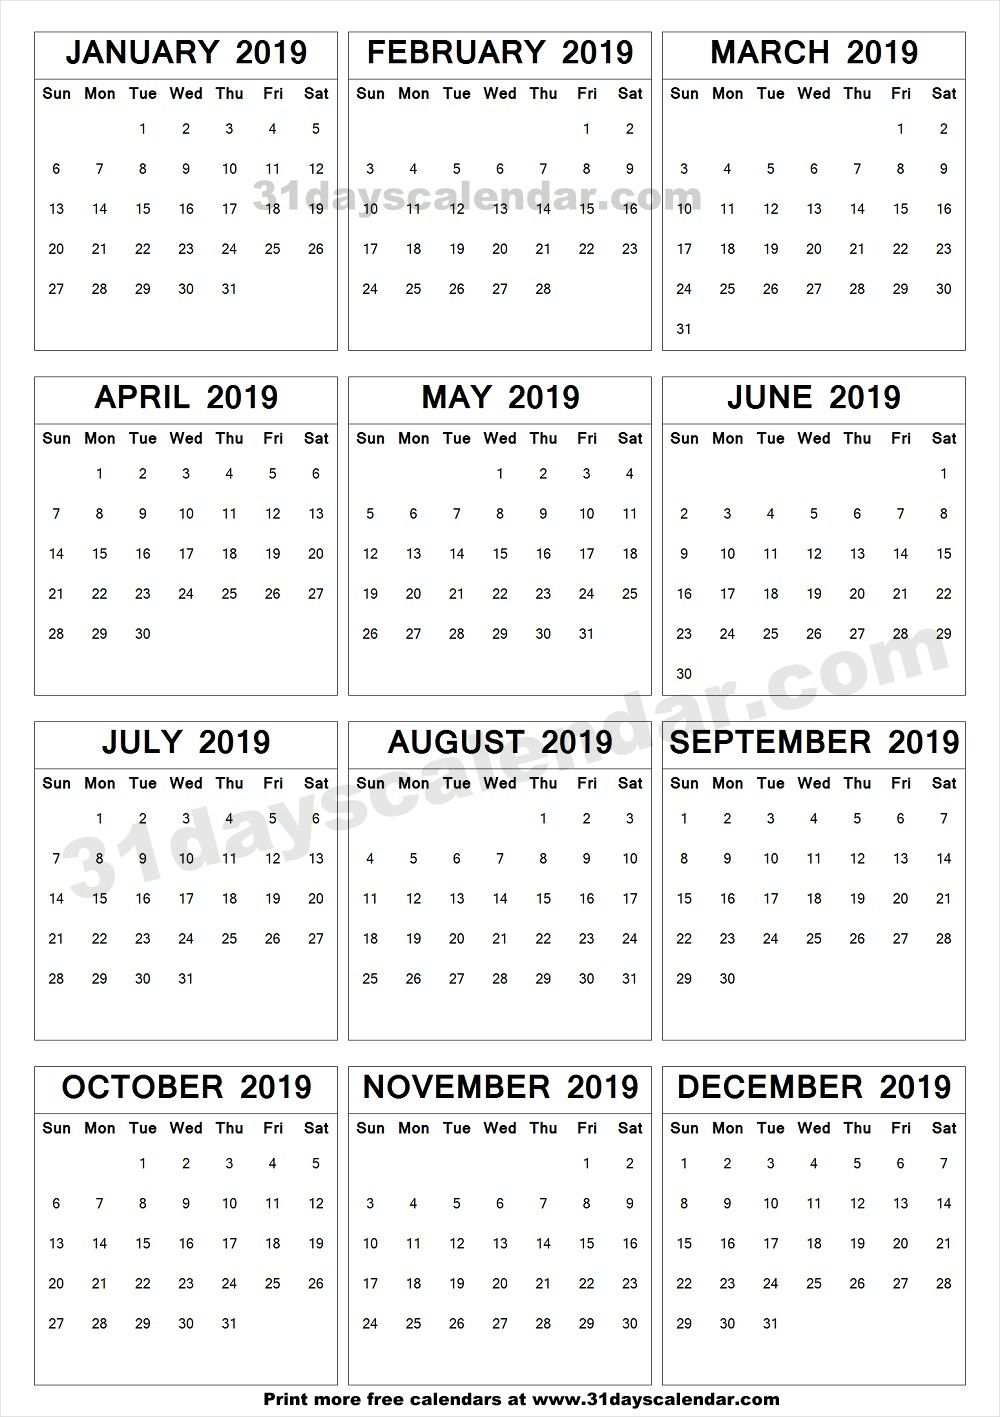 2019 A4 Calendar To Print